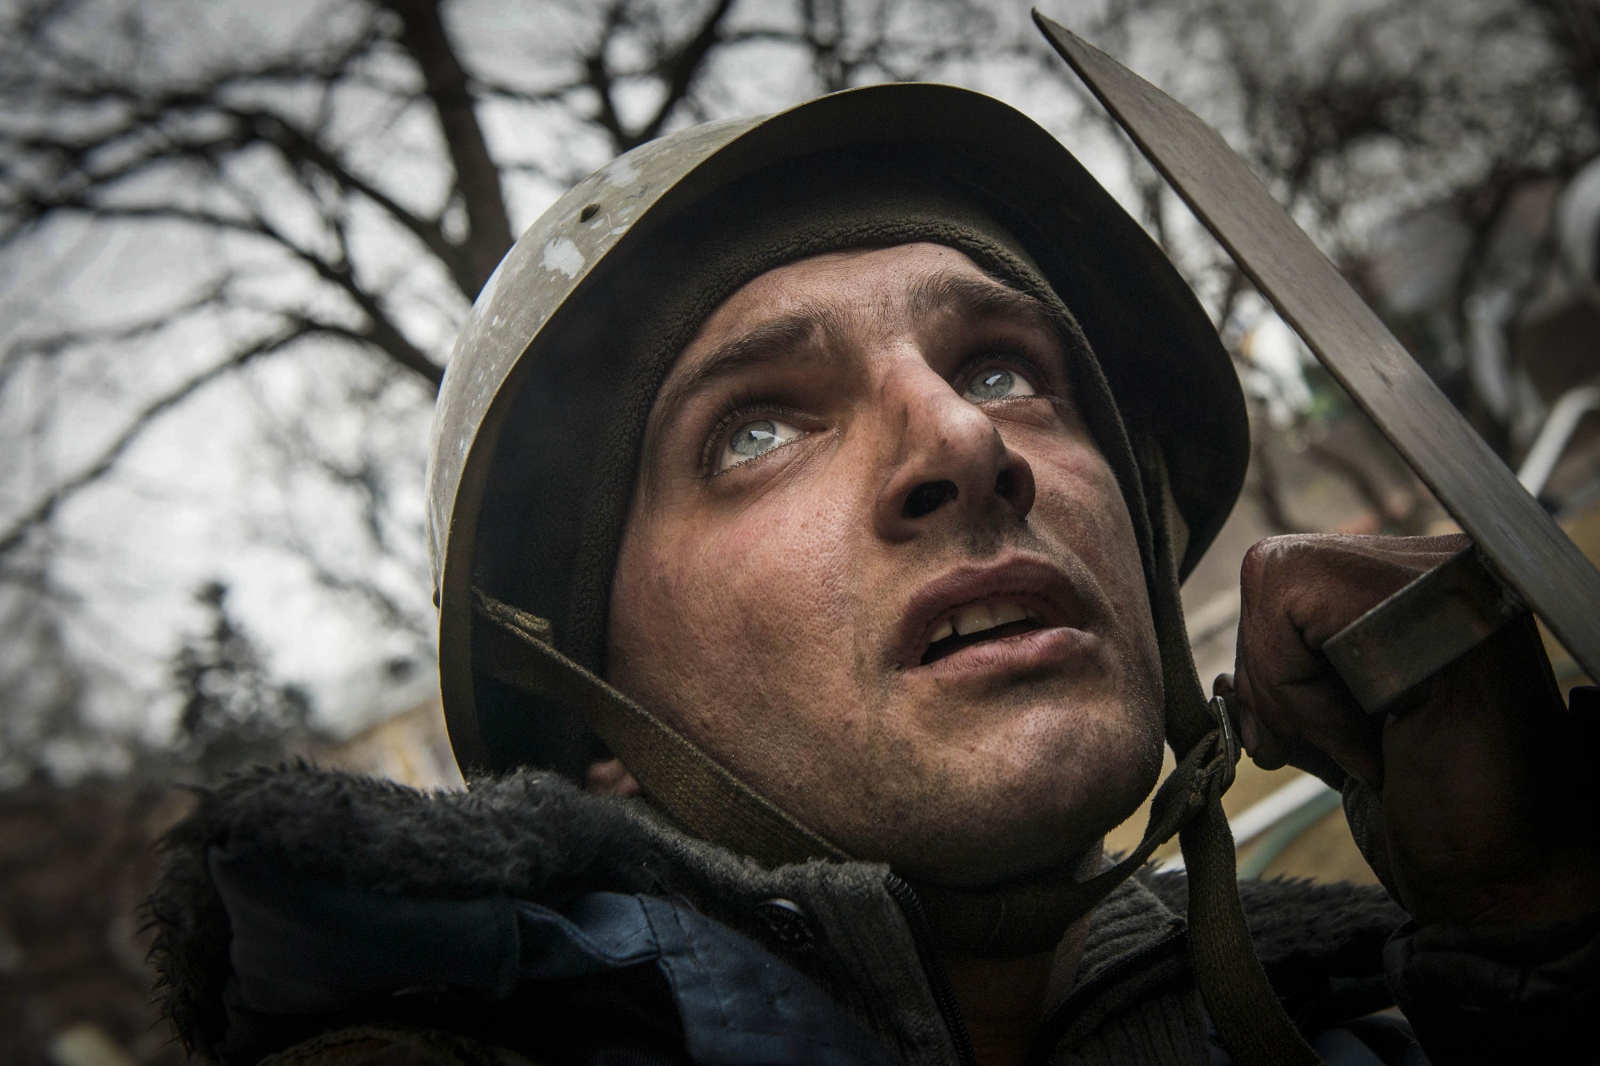 Art and Documentary Photography - Loading Behind_Kiev_s_barricades_063.jpg